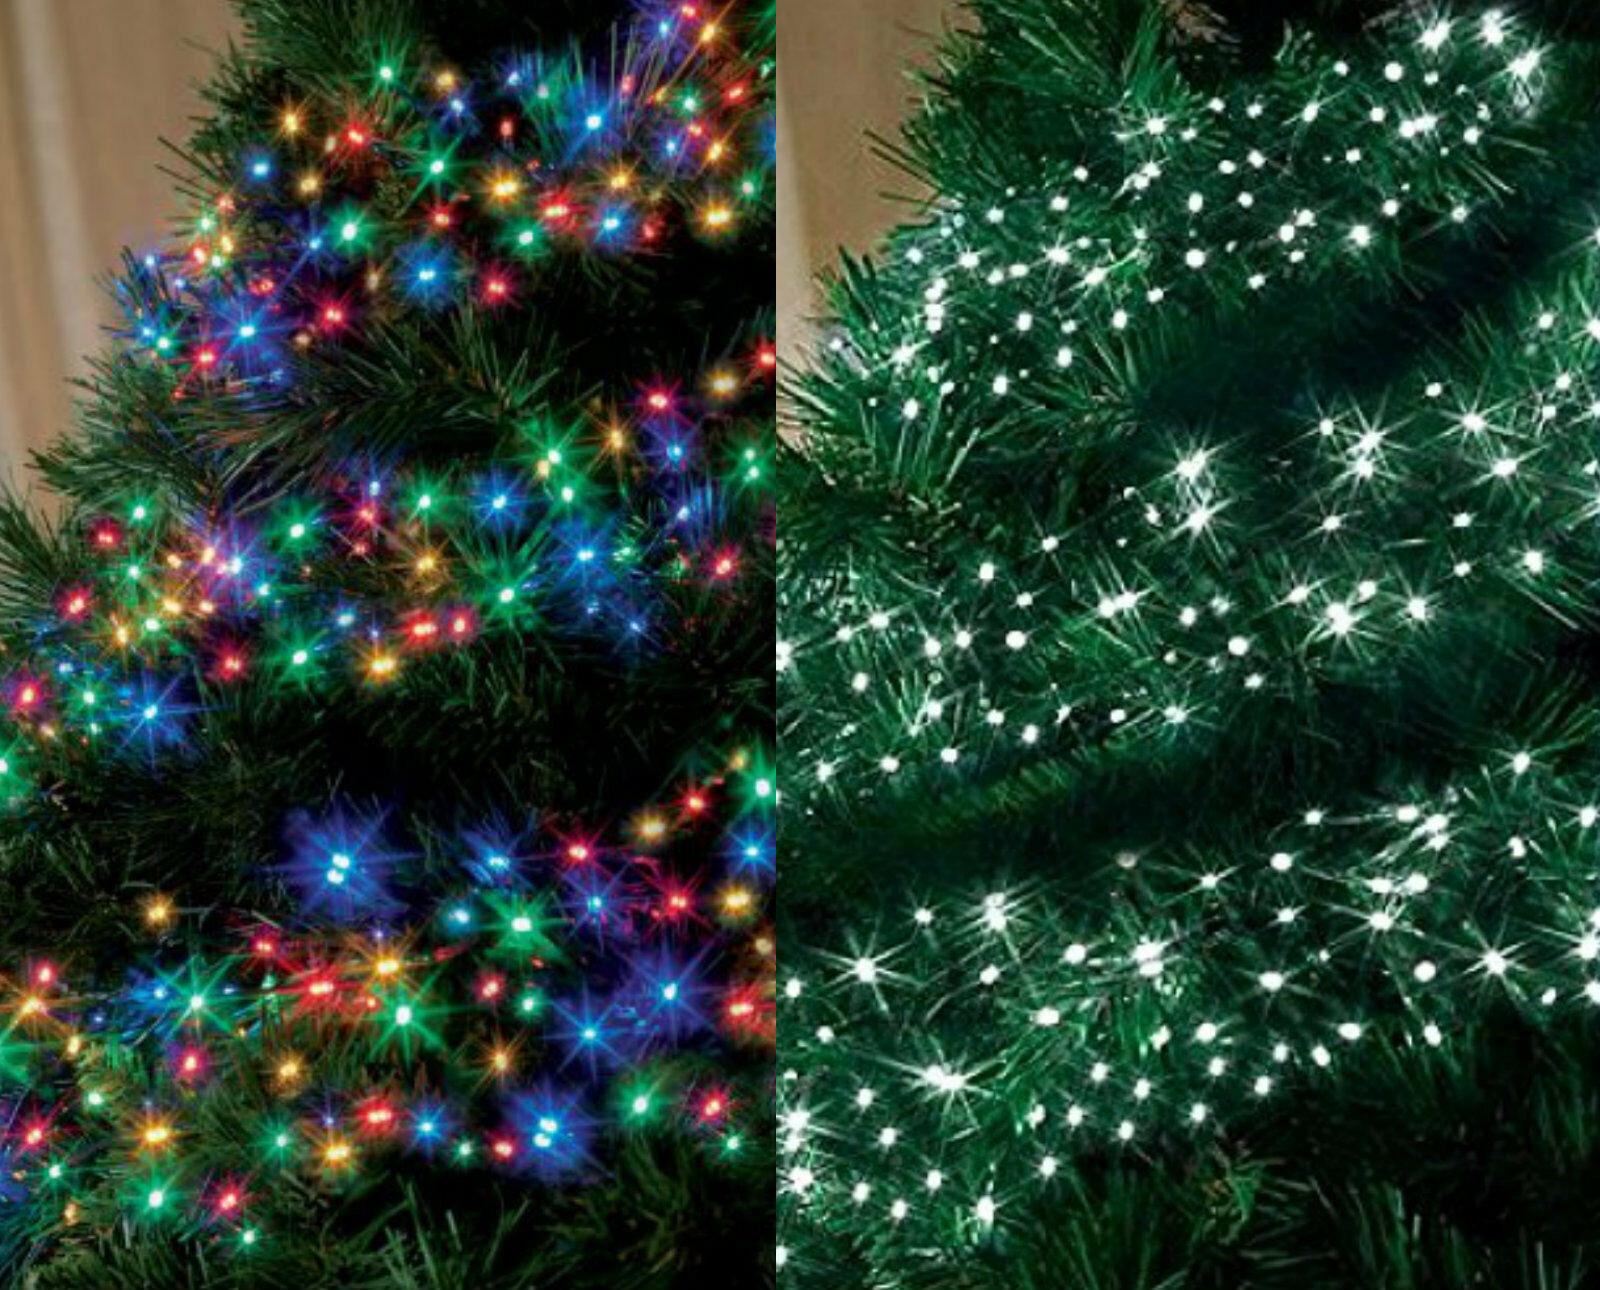 Indoor Outdoor Christmas Light  CHASING LED CLUSTER CHRISTMAS LIGHTS LIGHTING TREE